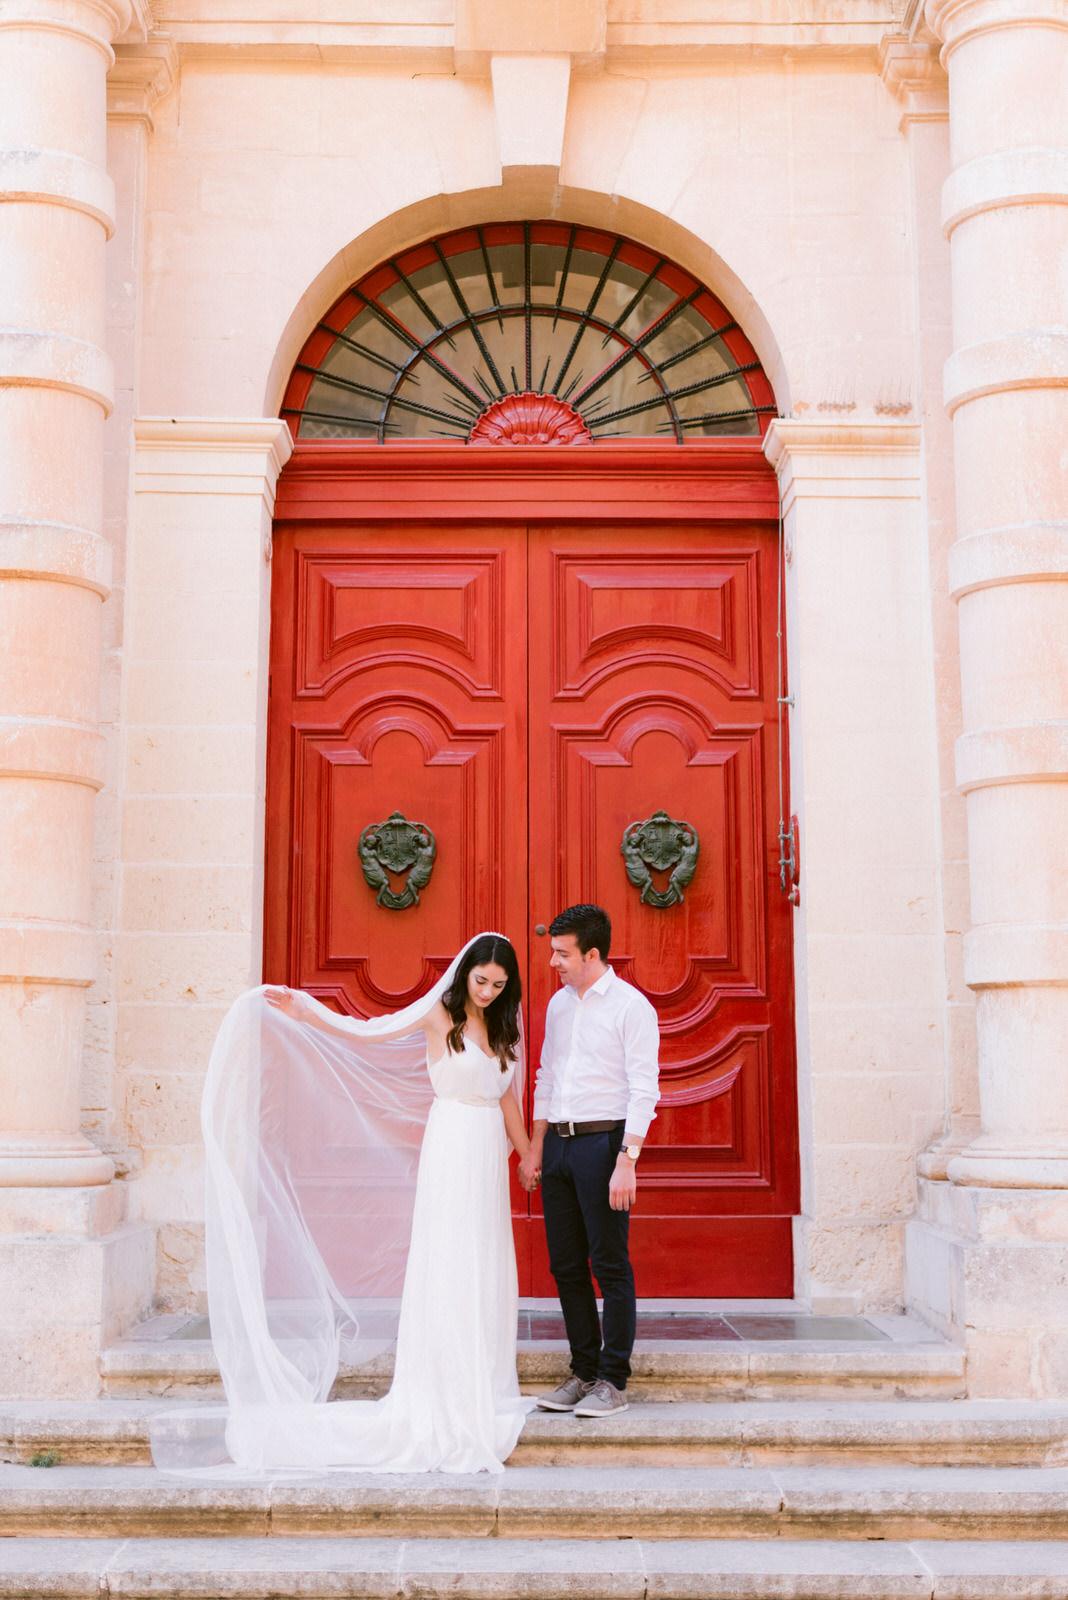 mdina wedding, malta wedding photography, malta elopement, golden bay malta wedding photos, wedding photographer malta, malta wedding venue, villa bologna wedding (15).jpg